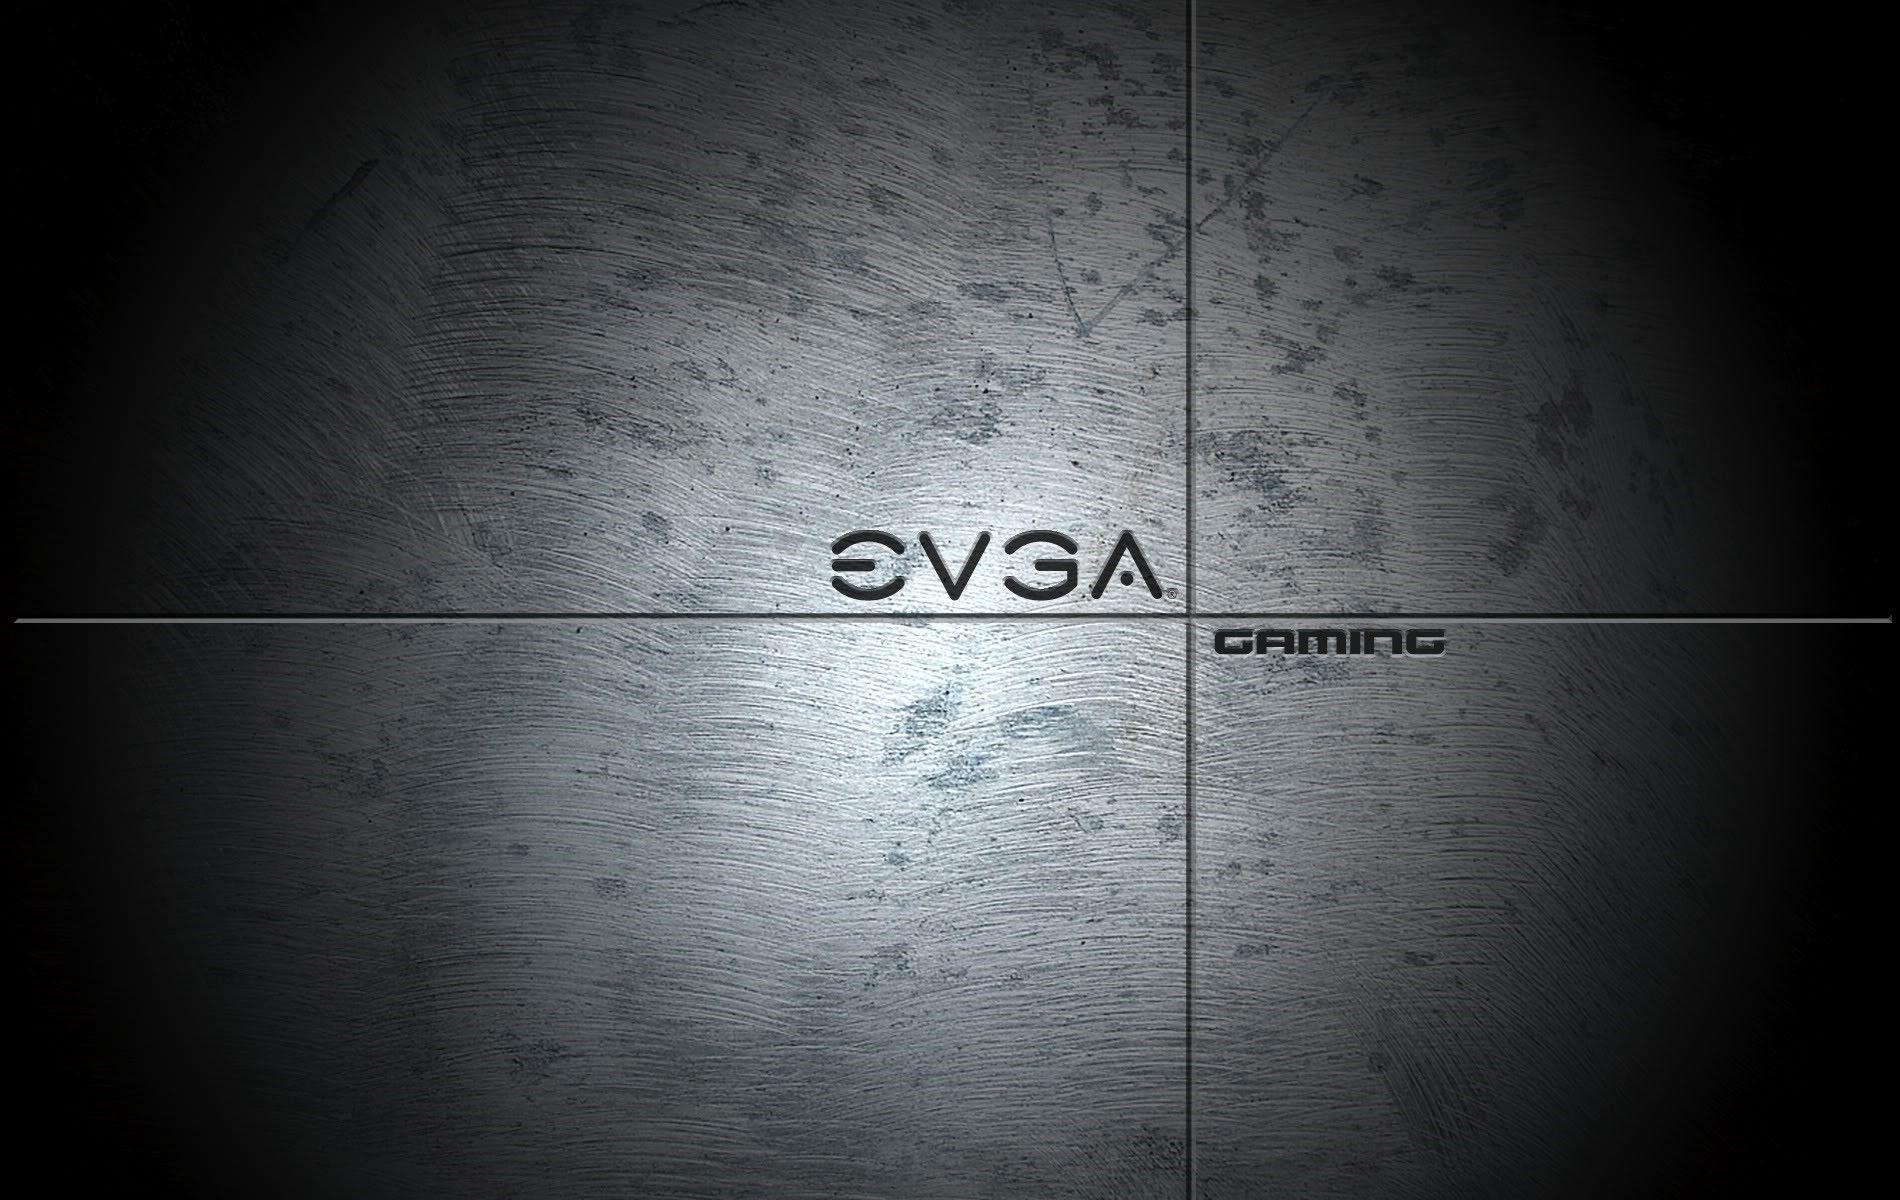 Evga Wallpapers Hd Wallpaper Cave